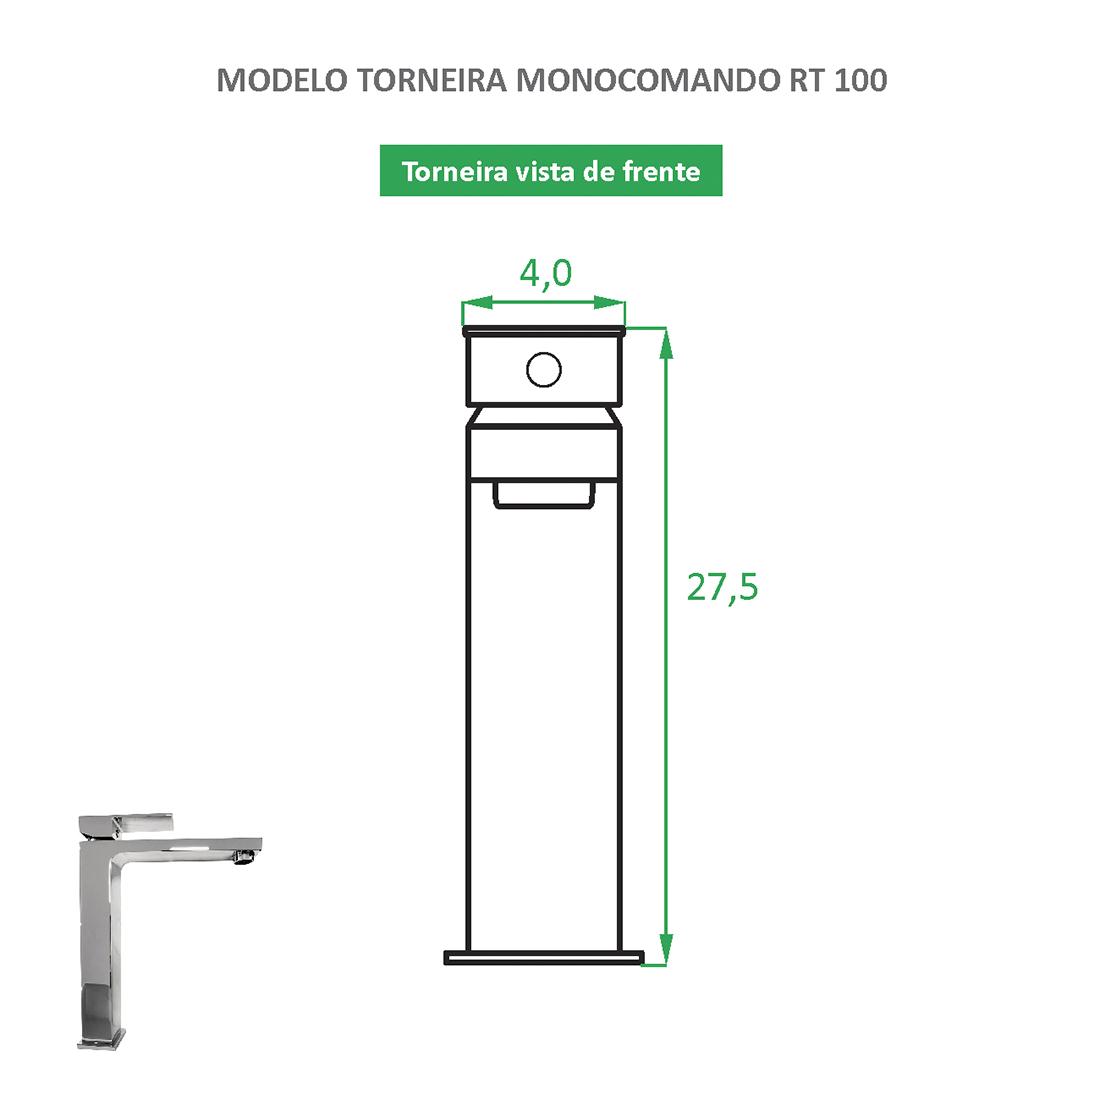 Torneira Monocomando bica alta RT 100